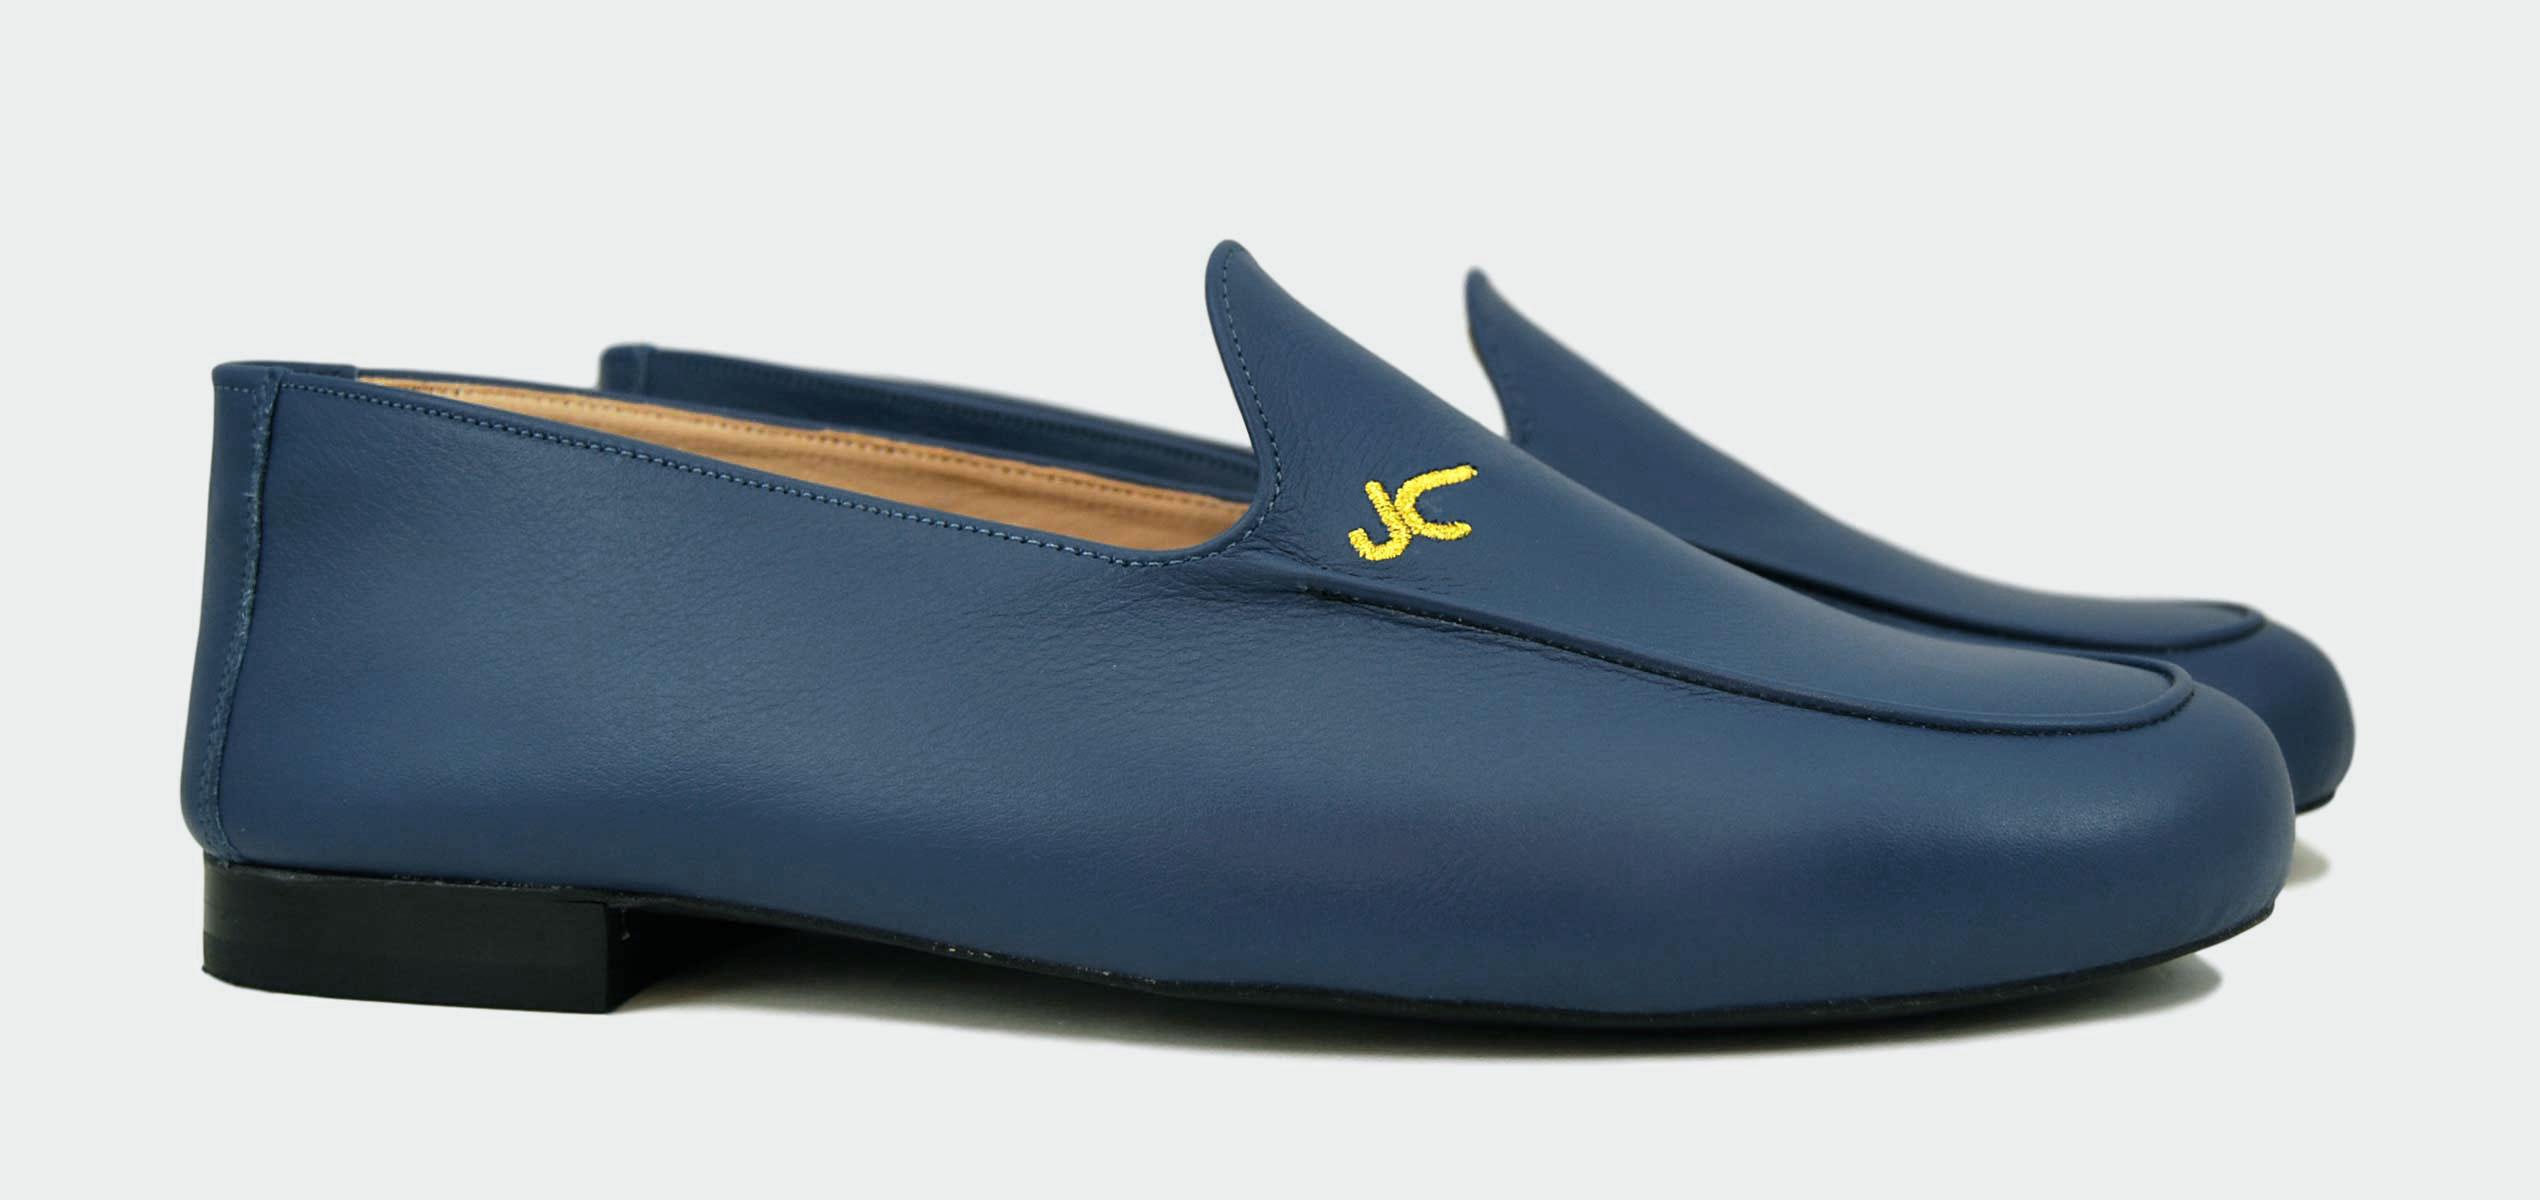 Foto 5 de Zapatos Julio Iglesias 528 JC Azafata Napa